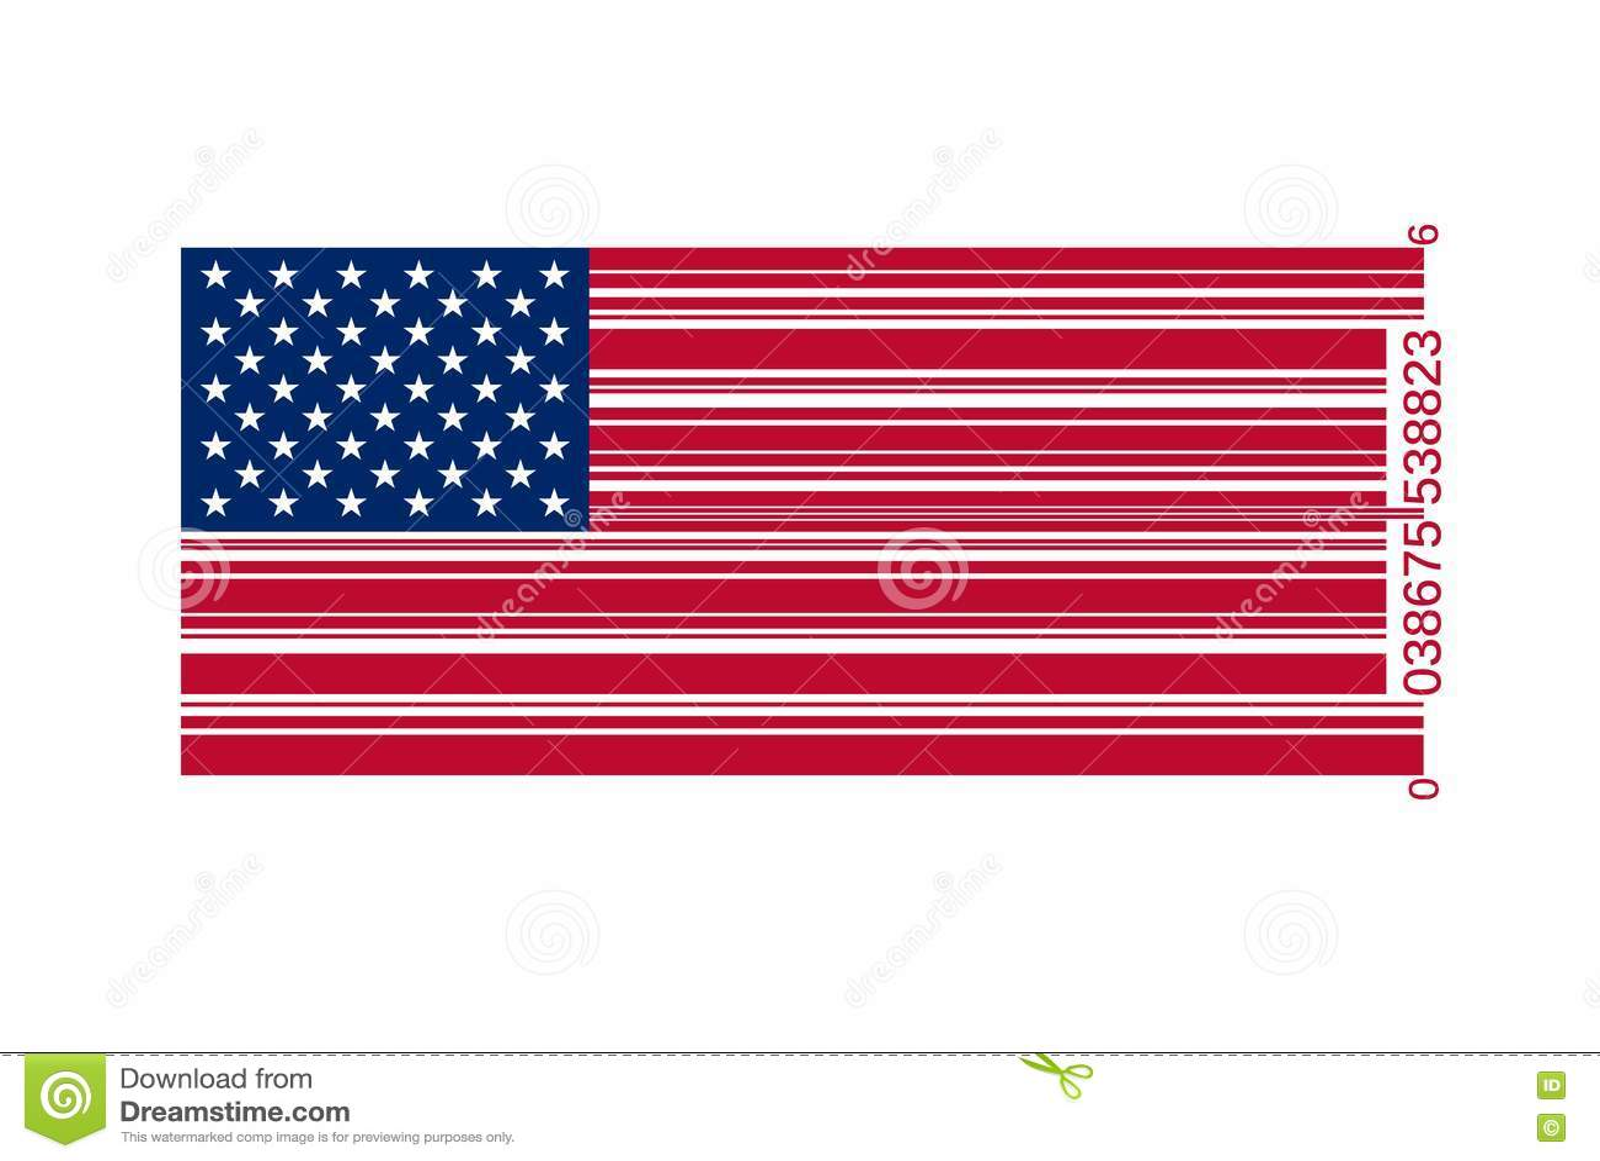 American Flag As Bar Code Royalty Free Stock Photo   Image  19425225 xE3LKnNh